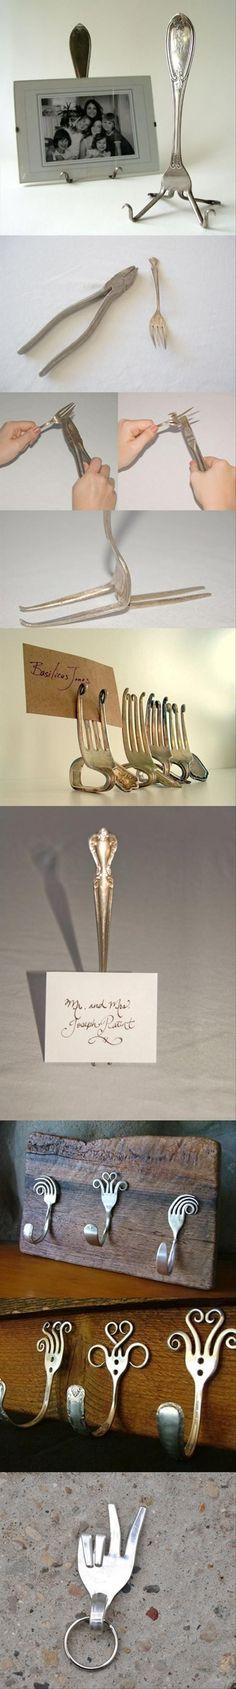 garfos